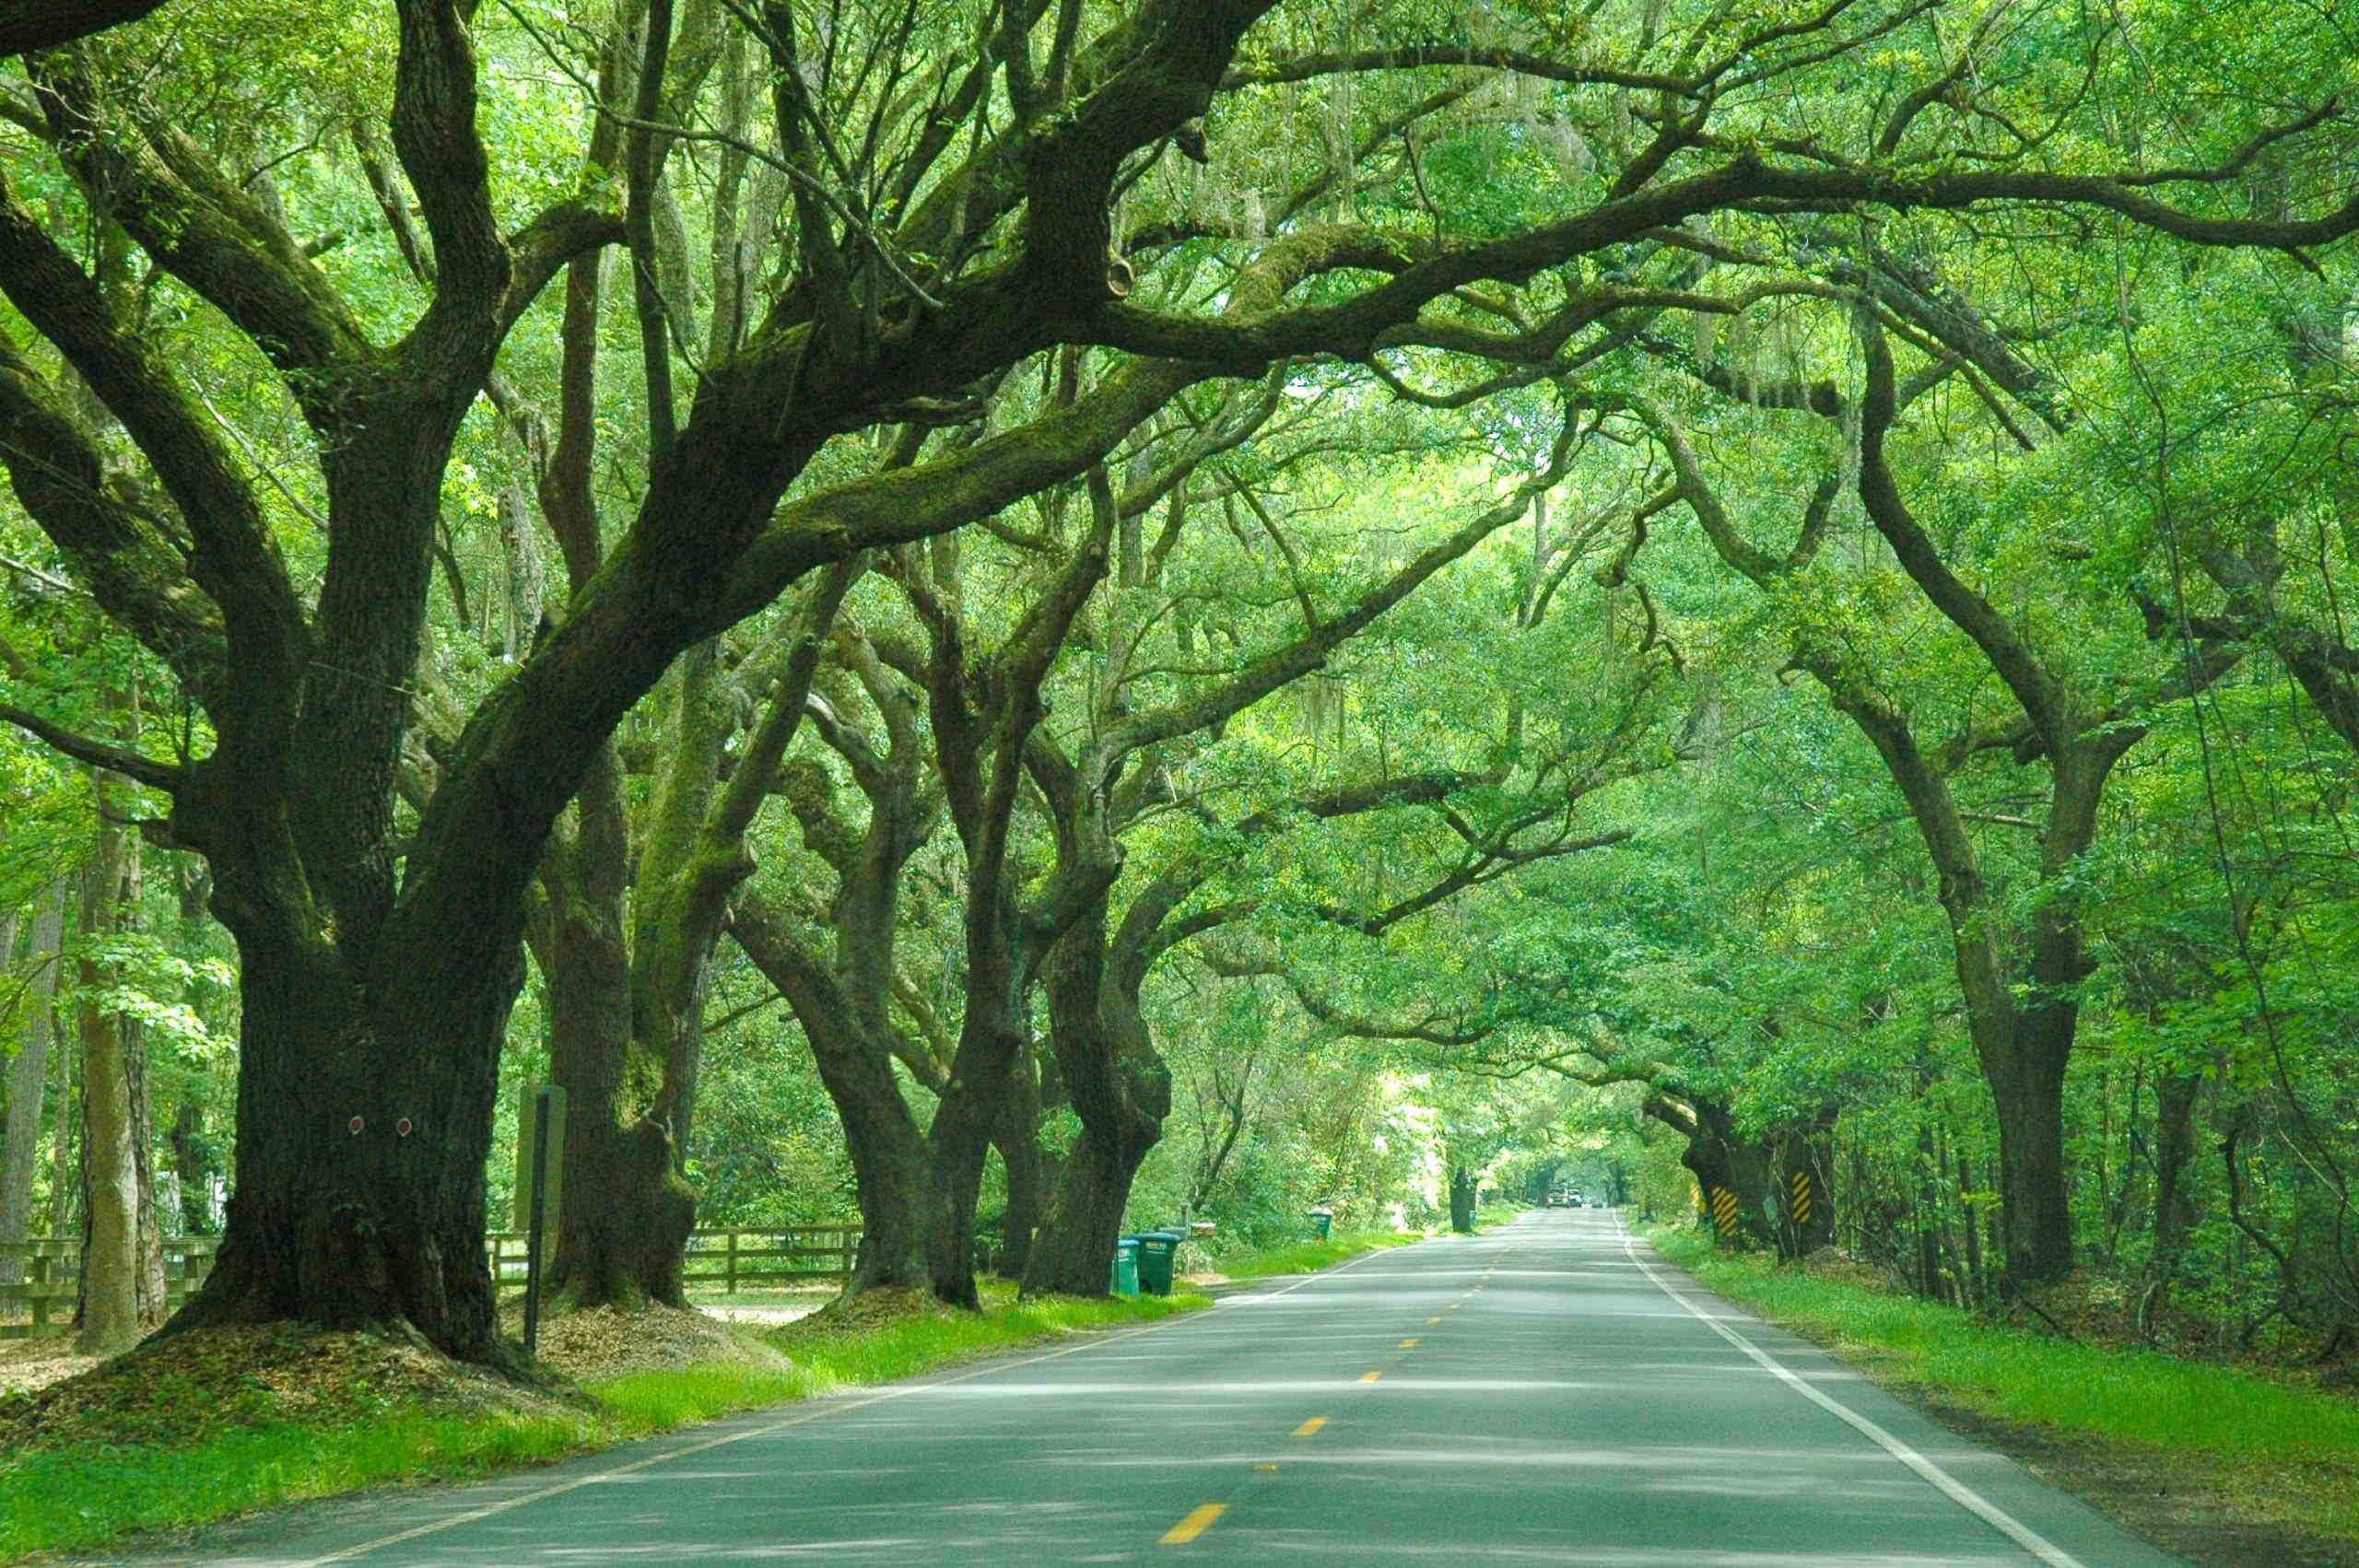 wadmalaw road with green oak trees